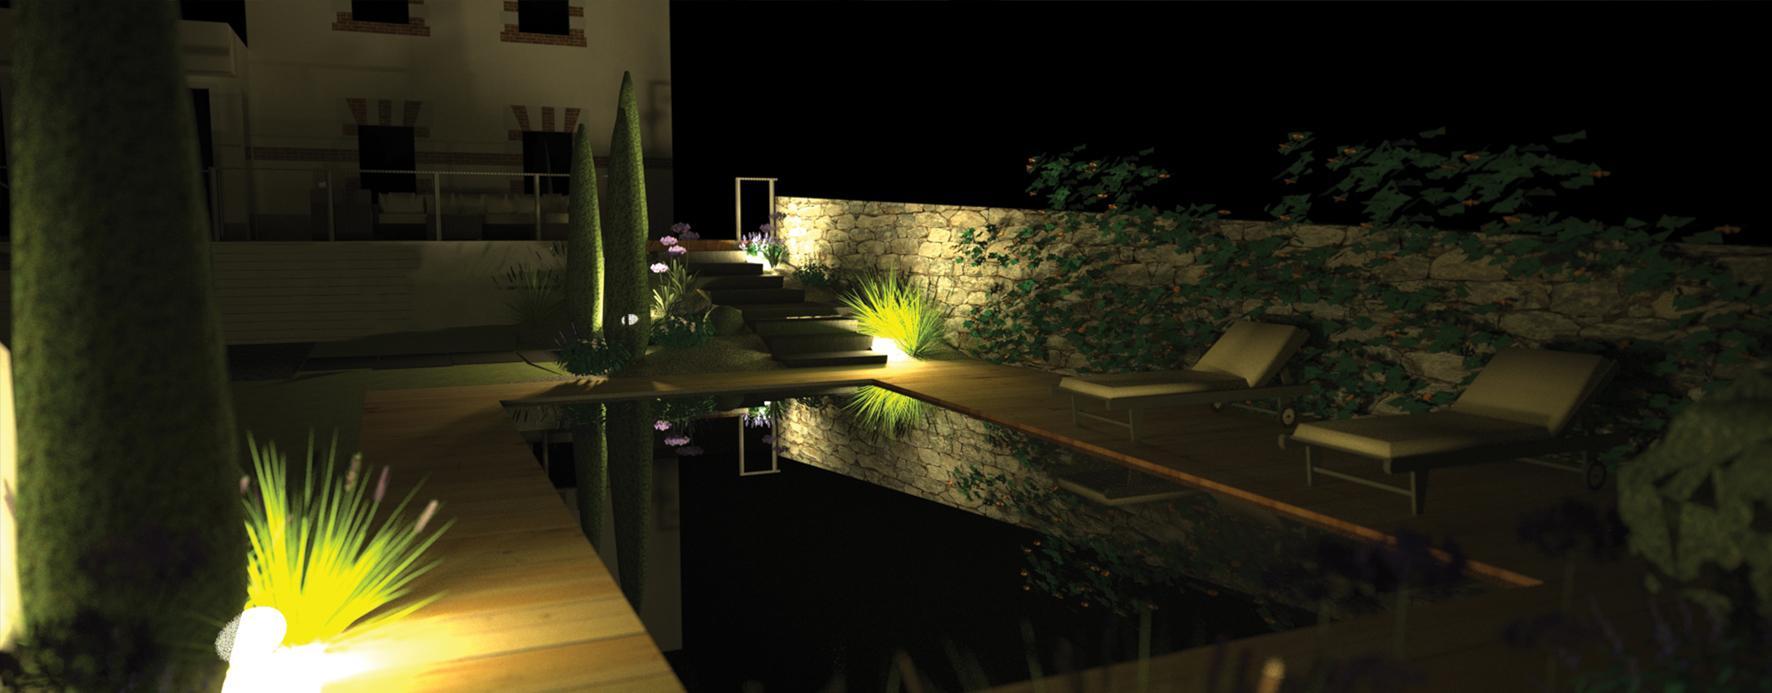 Jardin 3d dreamis - Jardin romantique nuit perpignan ...